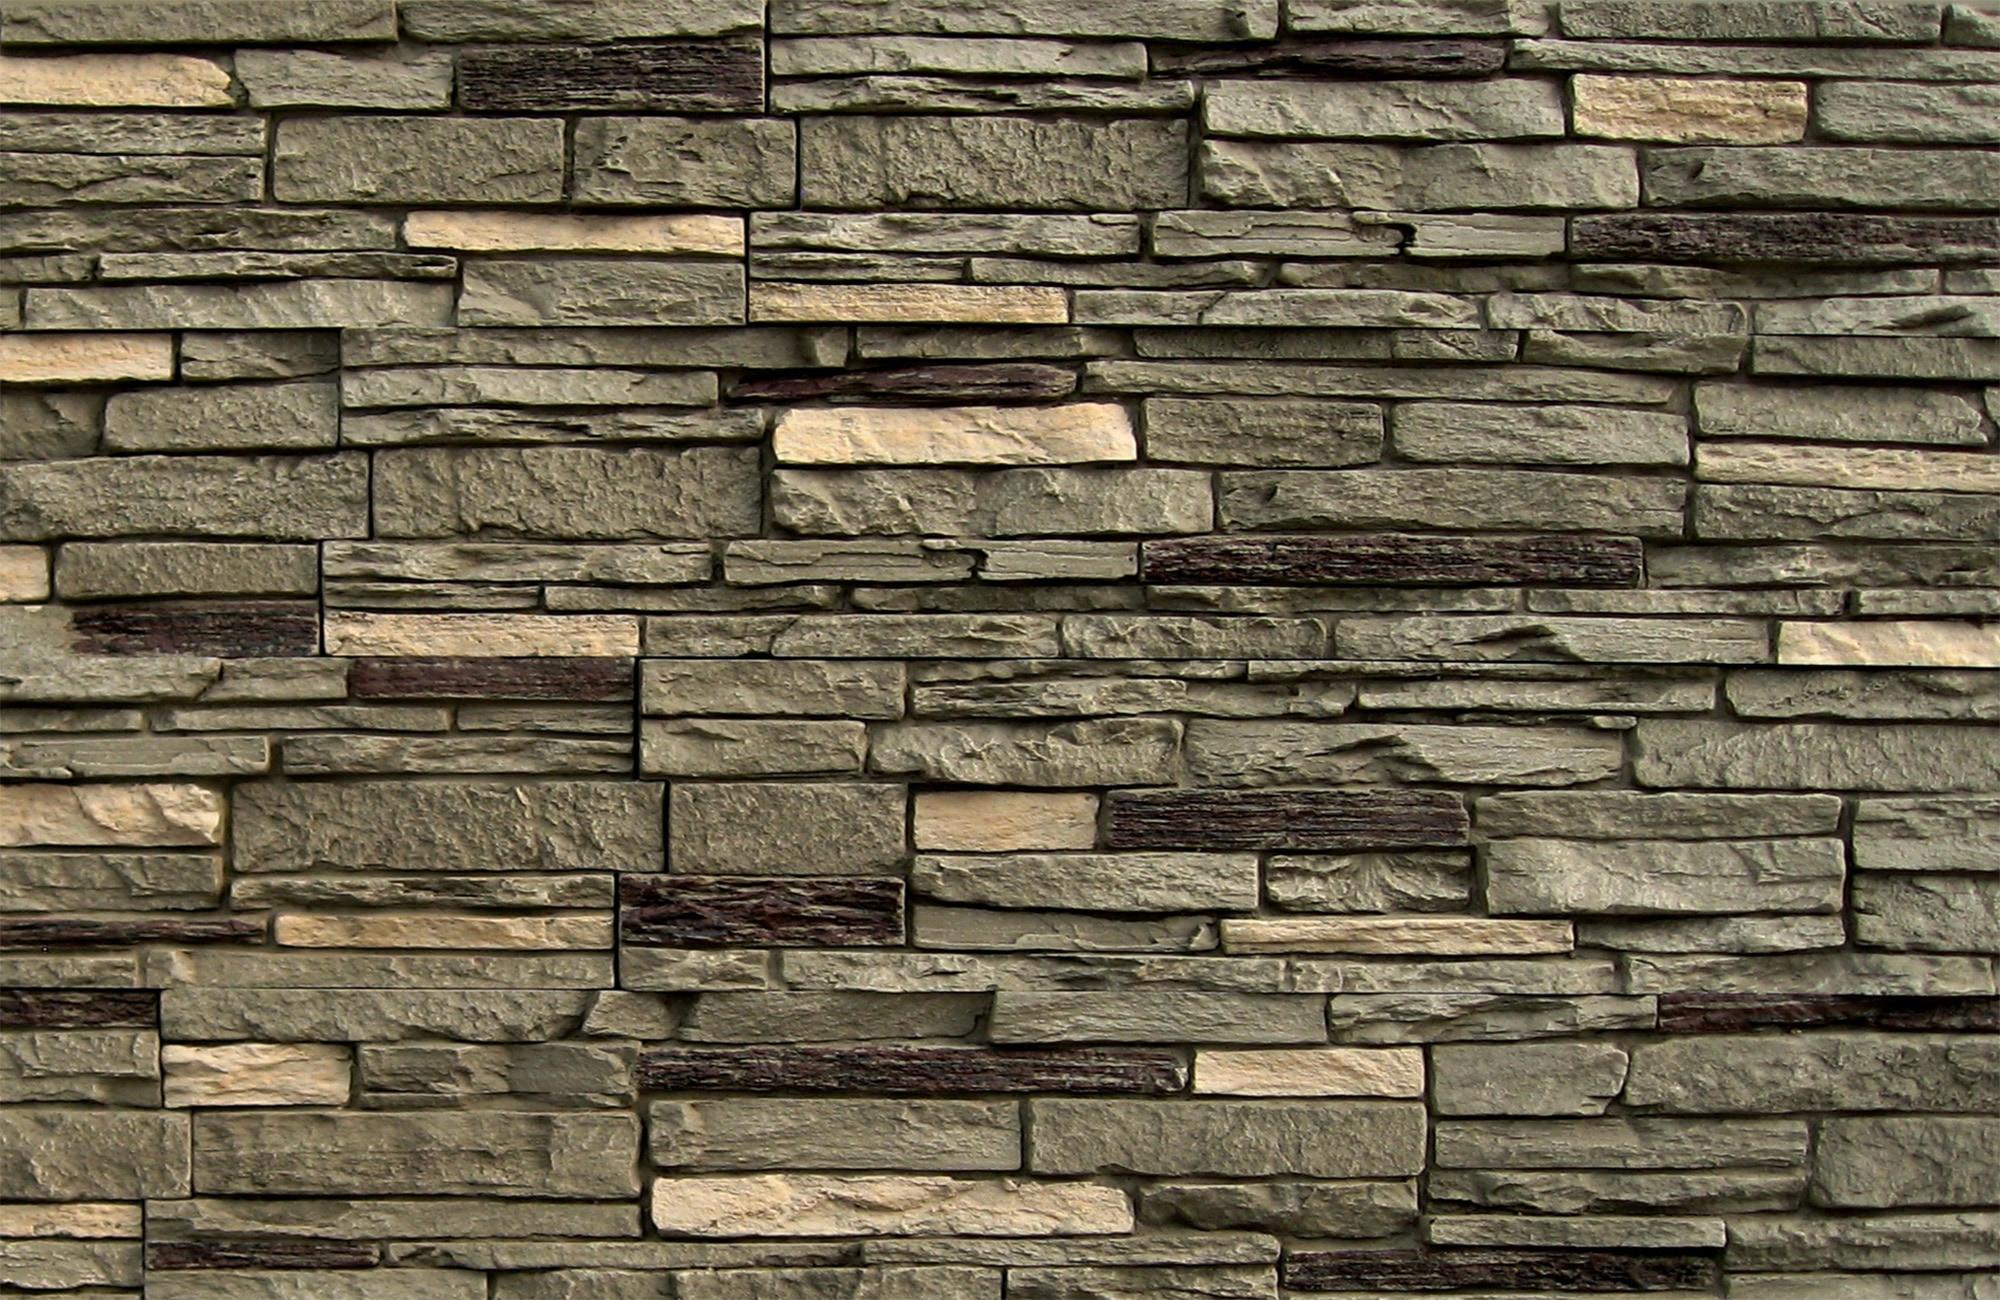 Faux-Stone-Panels-Exterior. Stoneworks Stoneworks Faux Stone Siding Slate Stone Iron 17 12 Sq Ft Flat